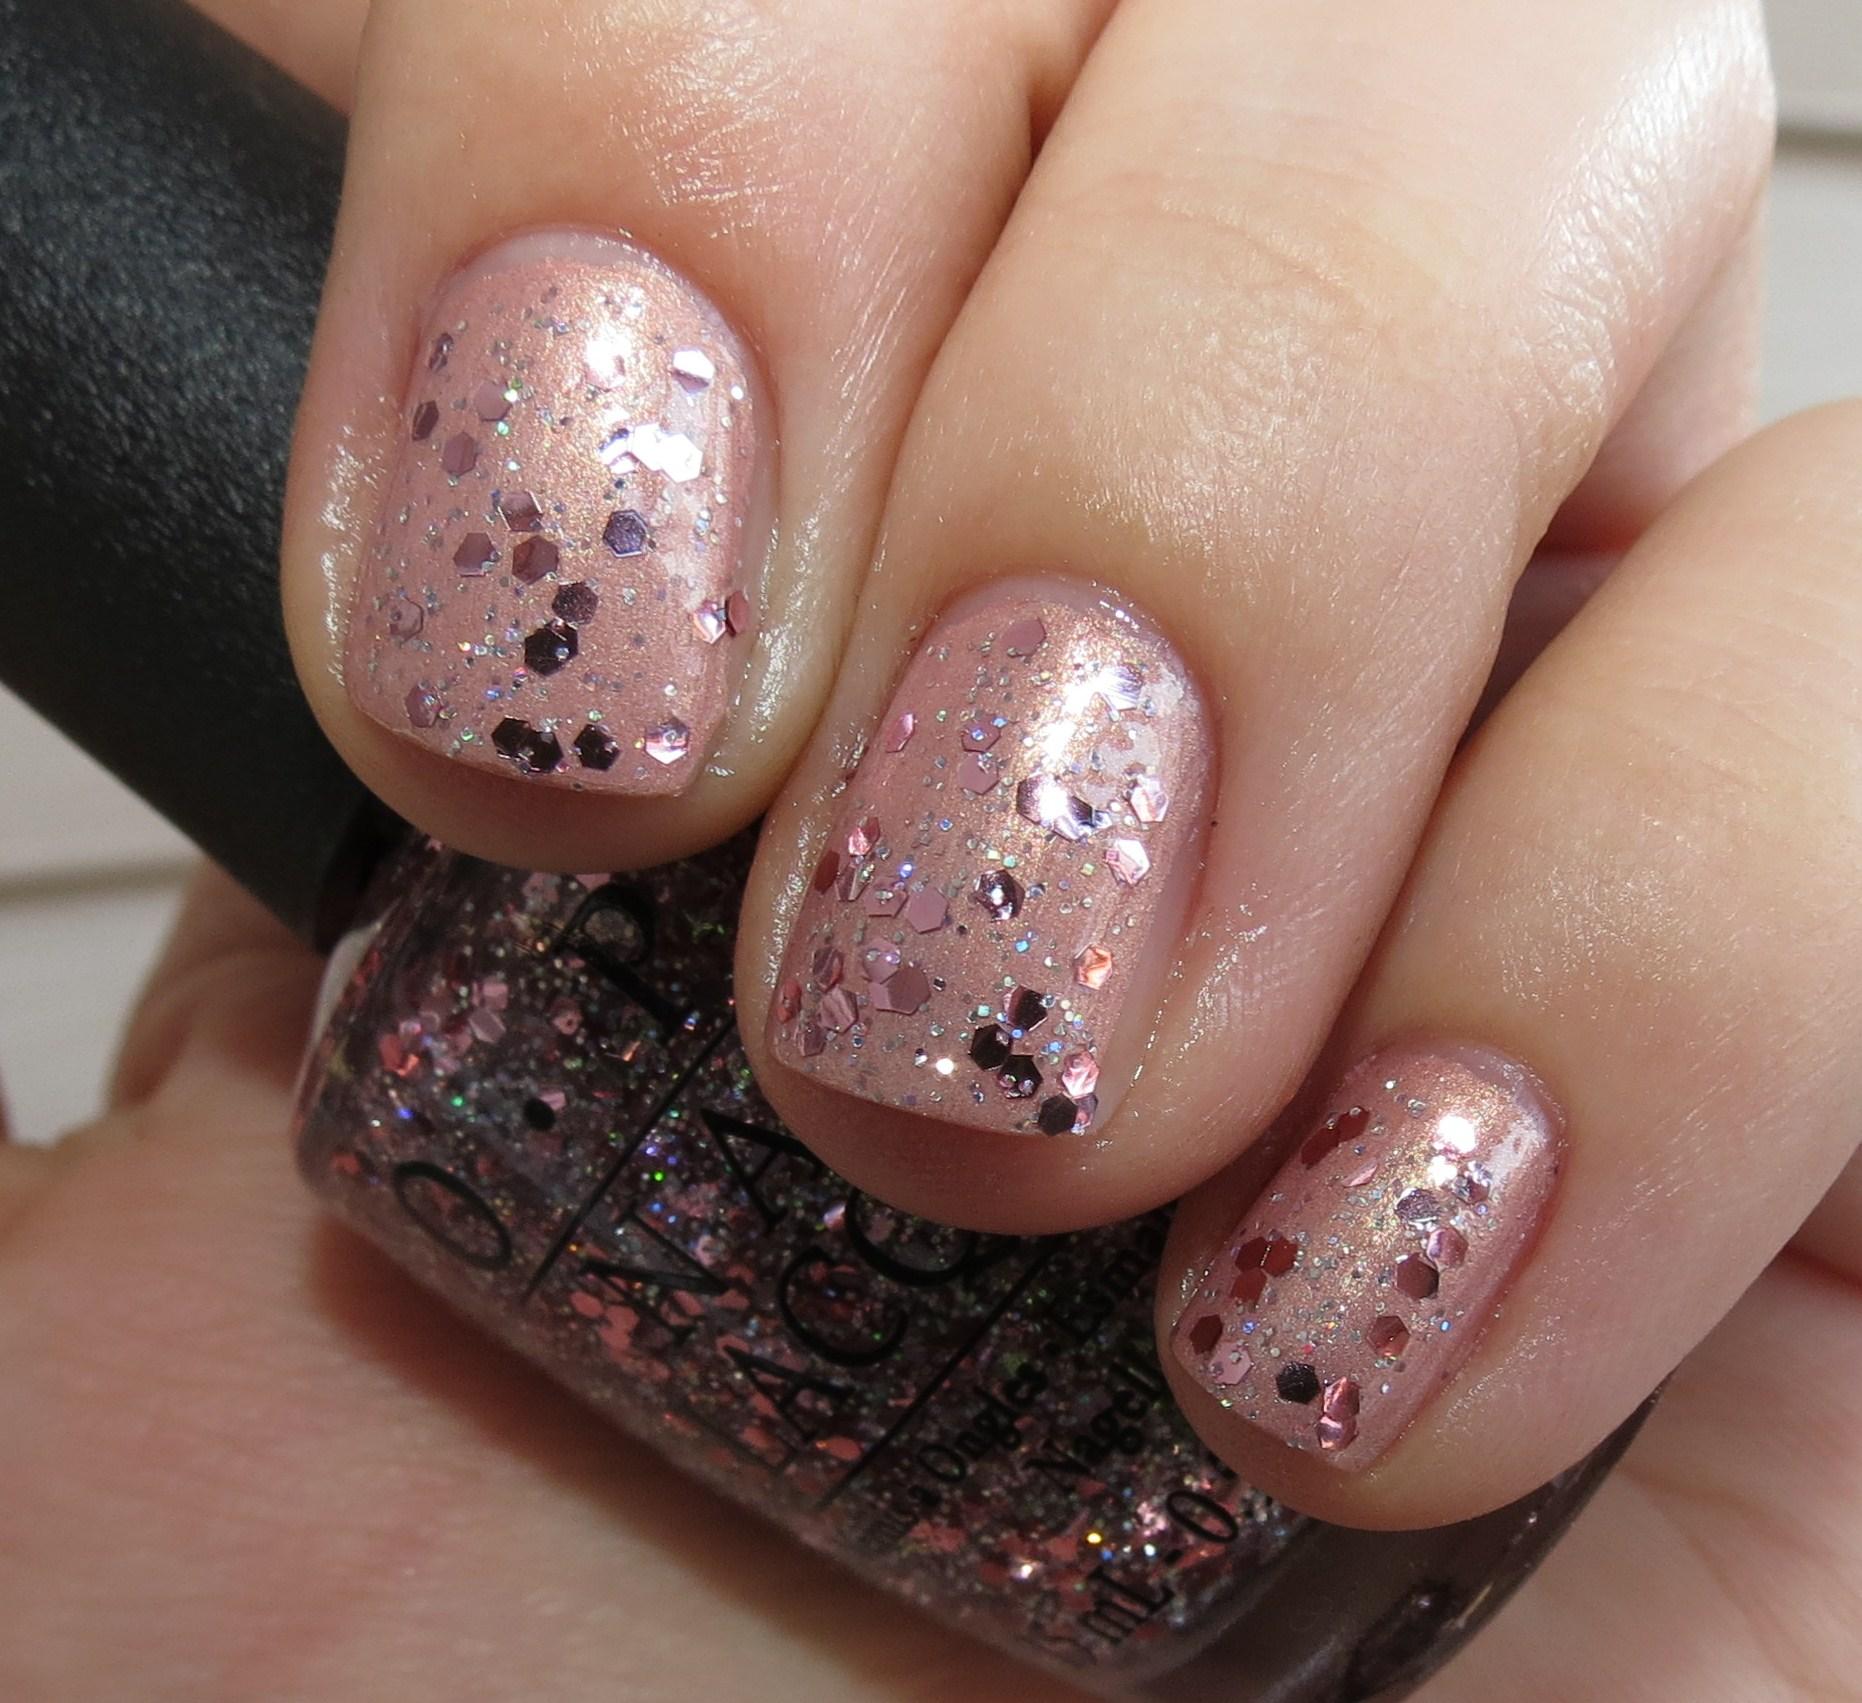 Pinkyet